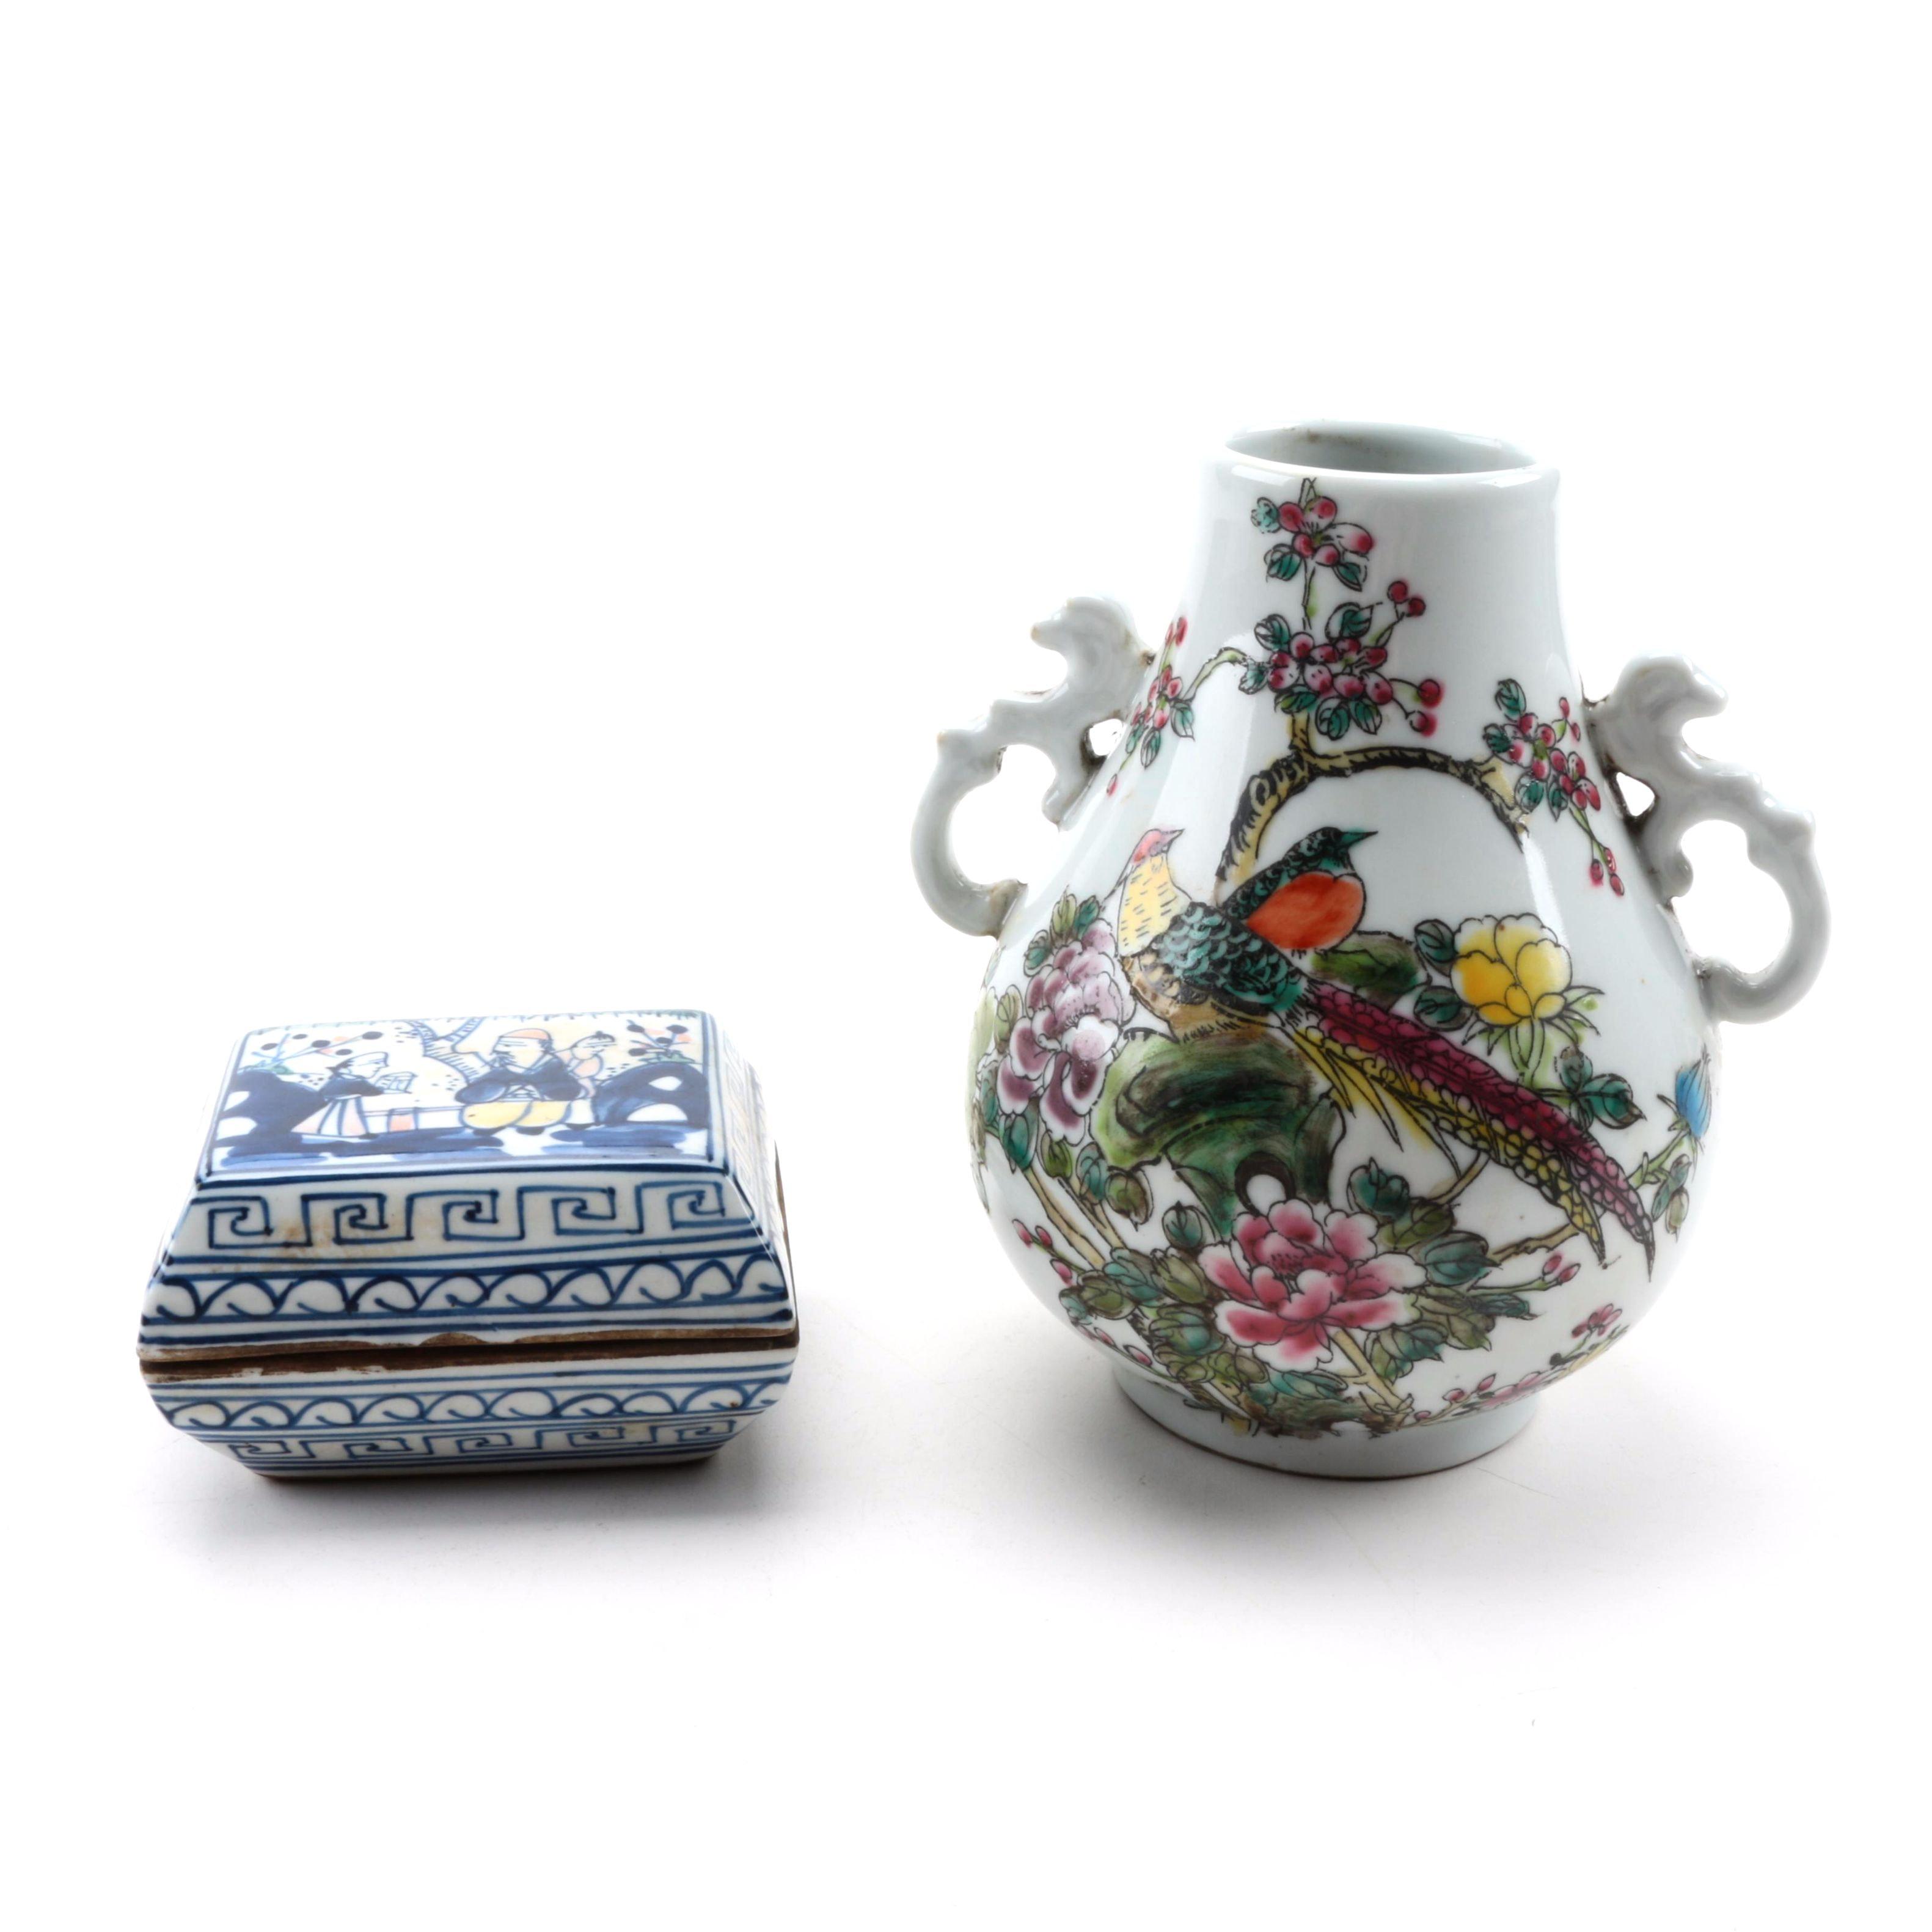 Chinese Ceramic Vase and Trinket Box